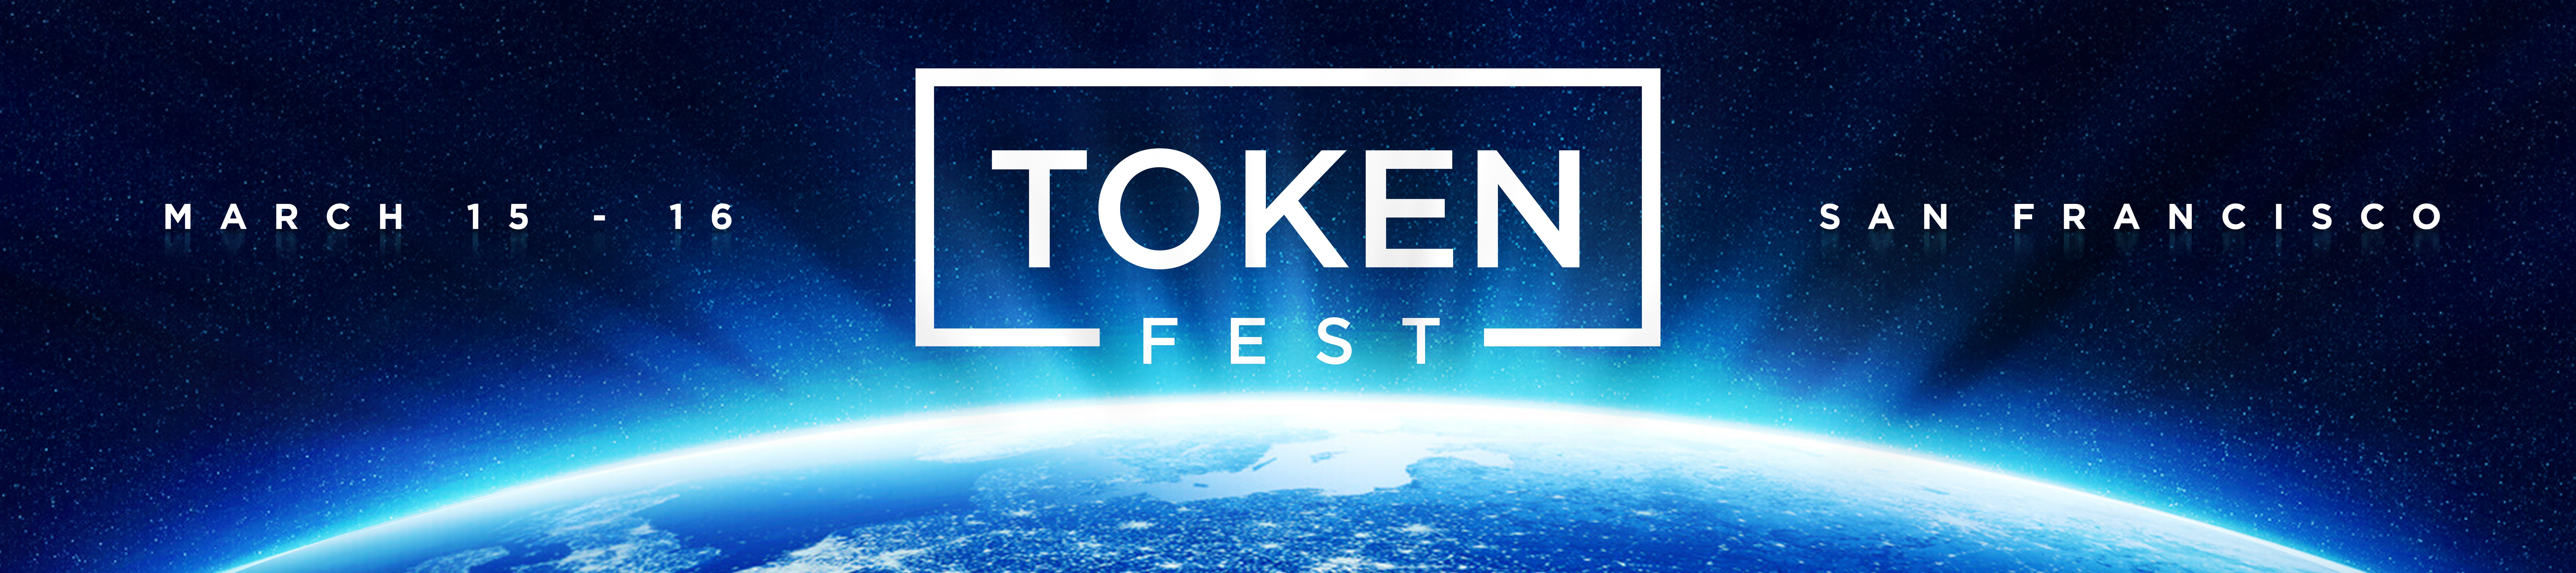 Token Fest Registration Area Wall Graphic